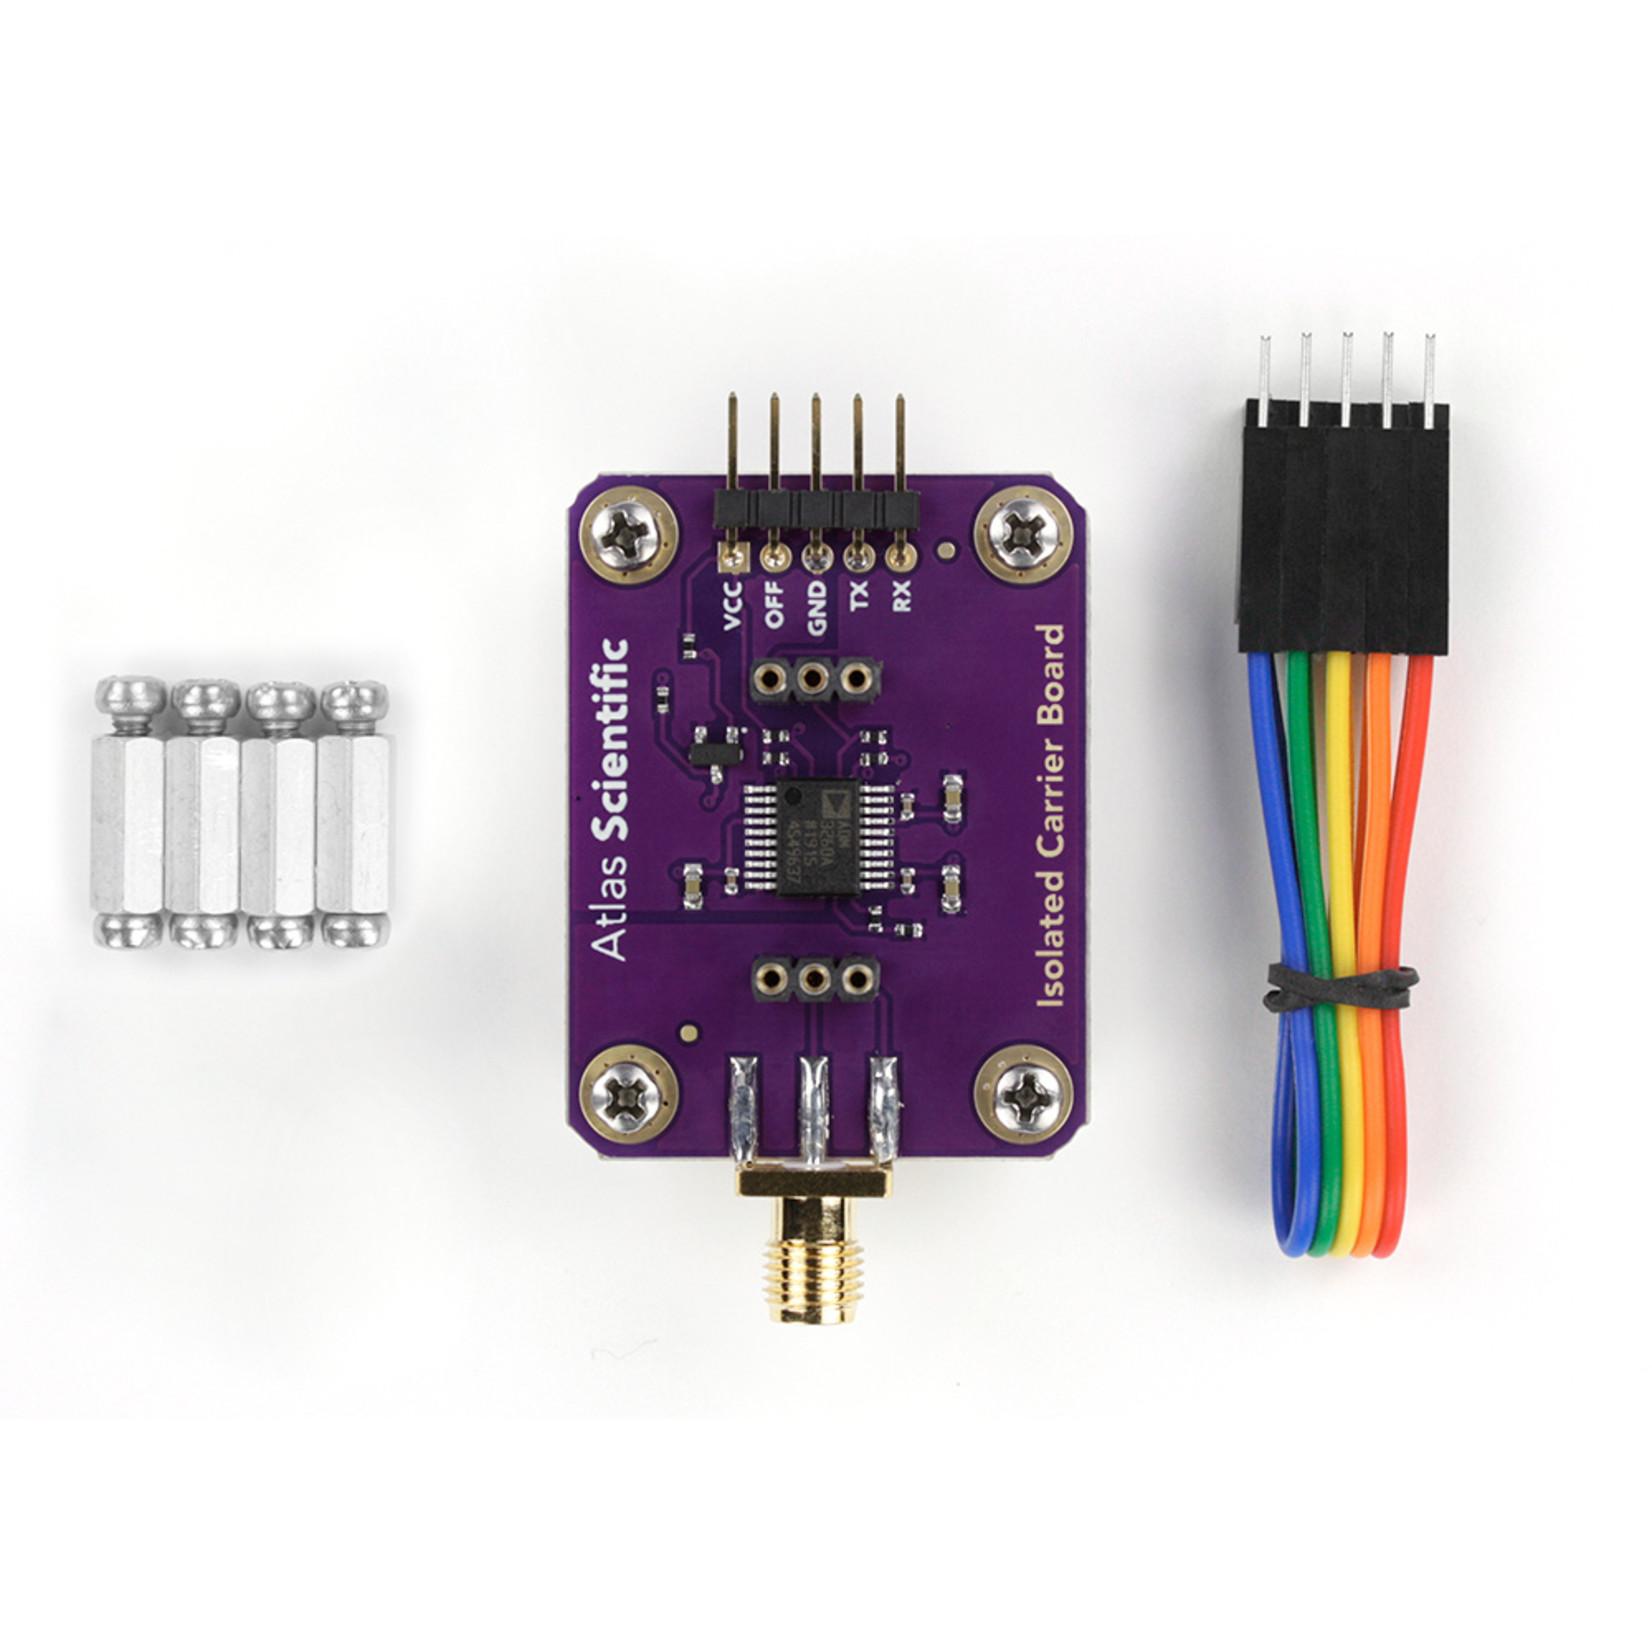 Atlas Scientific Geleidbaarheid Sensor K 0.1 Kit